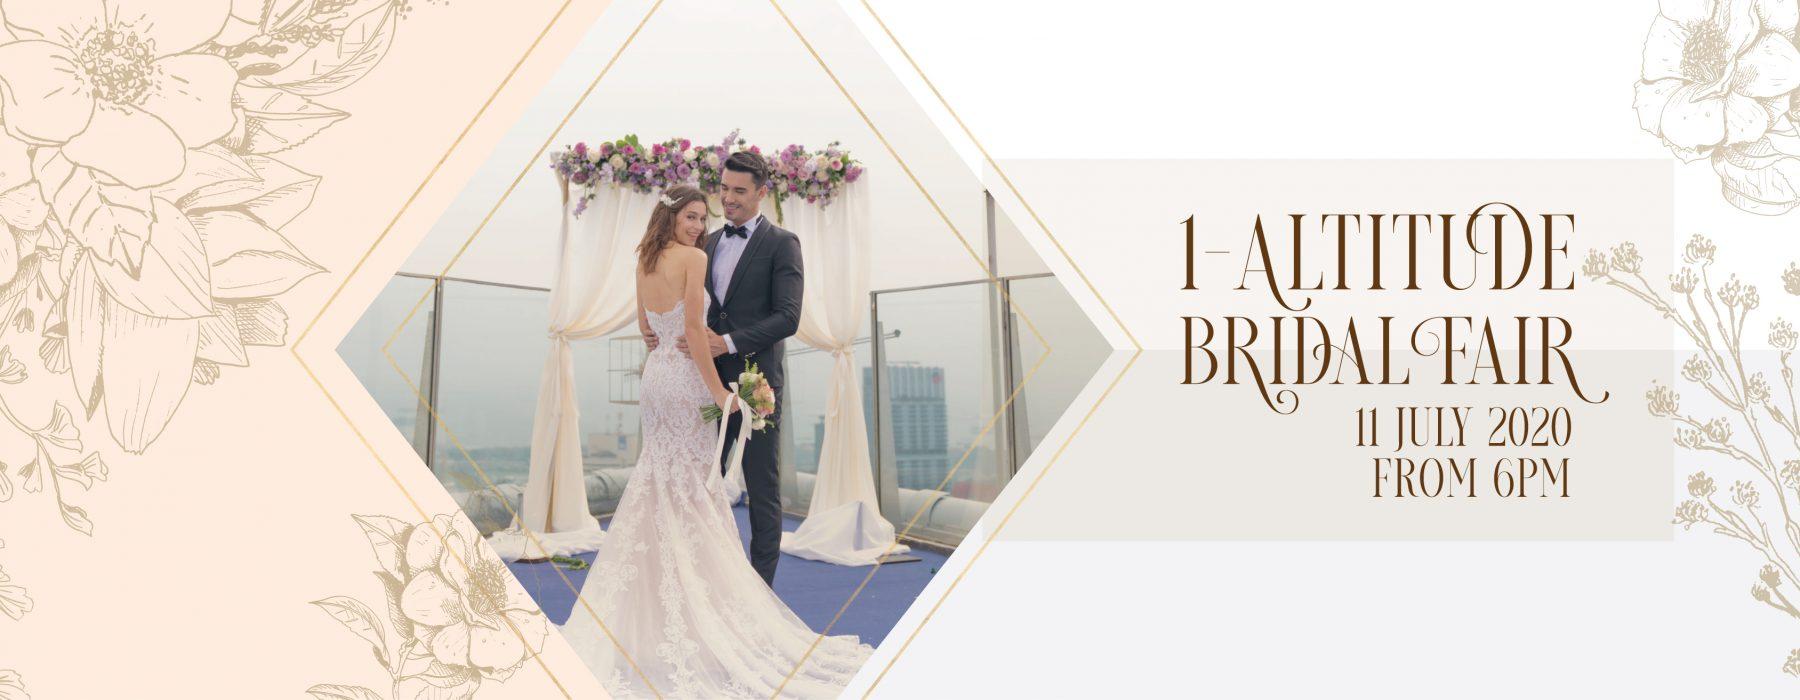 1-Altitude Bridal Fair Email Banner